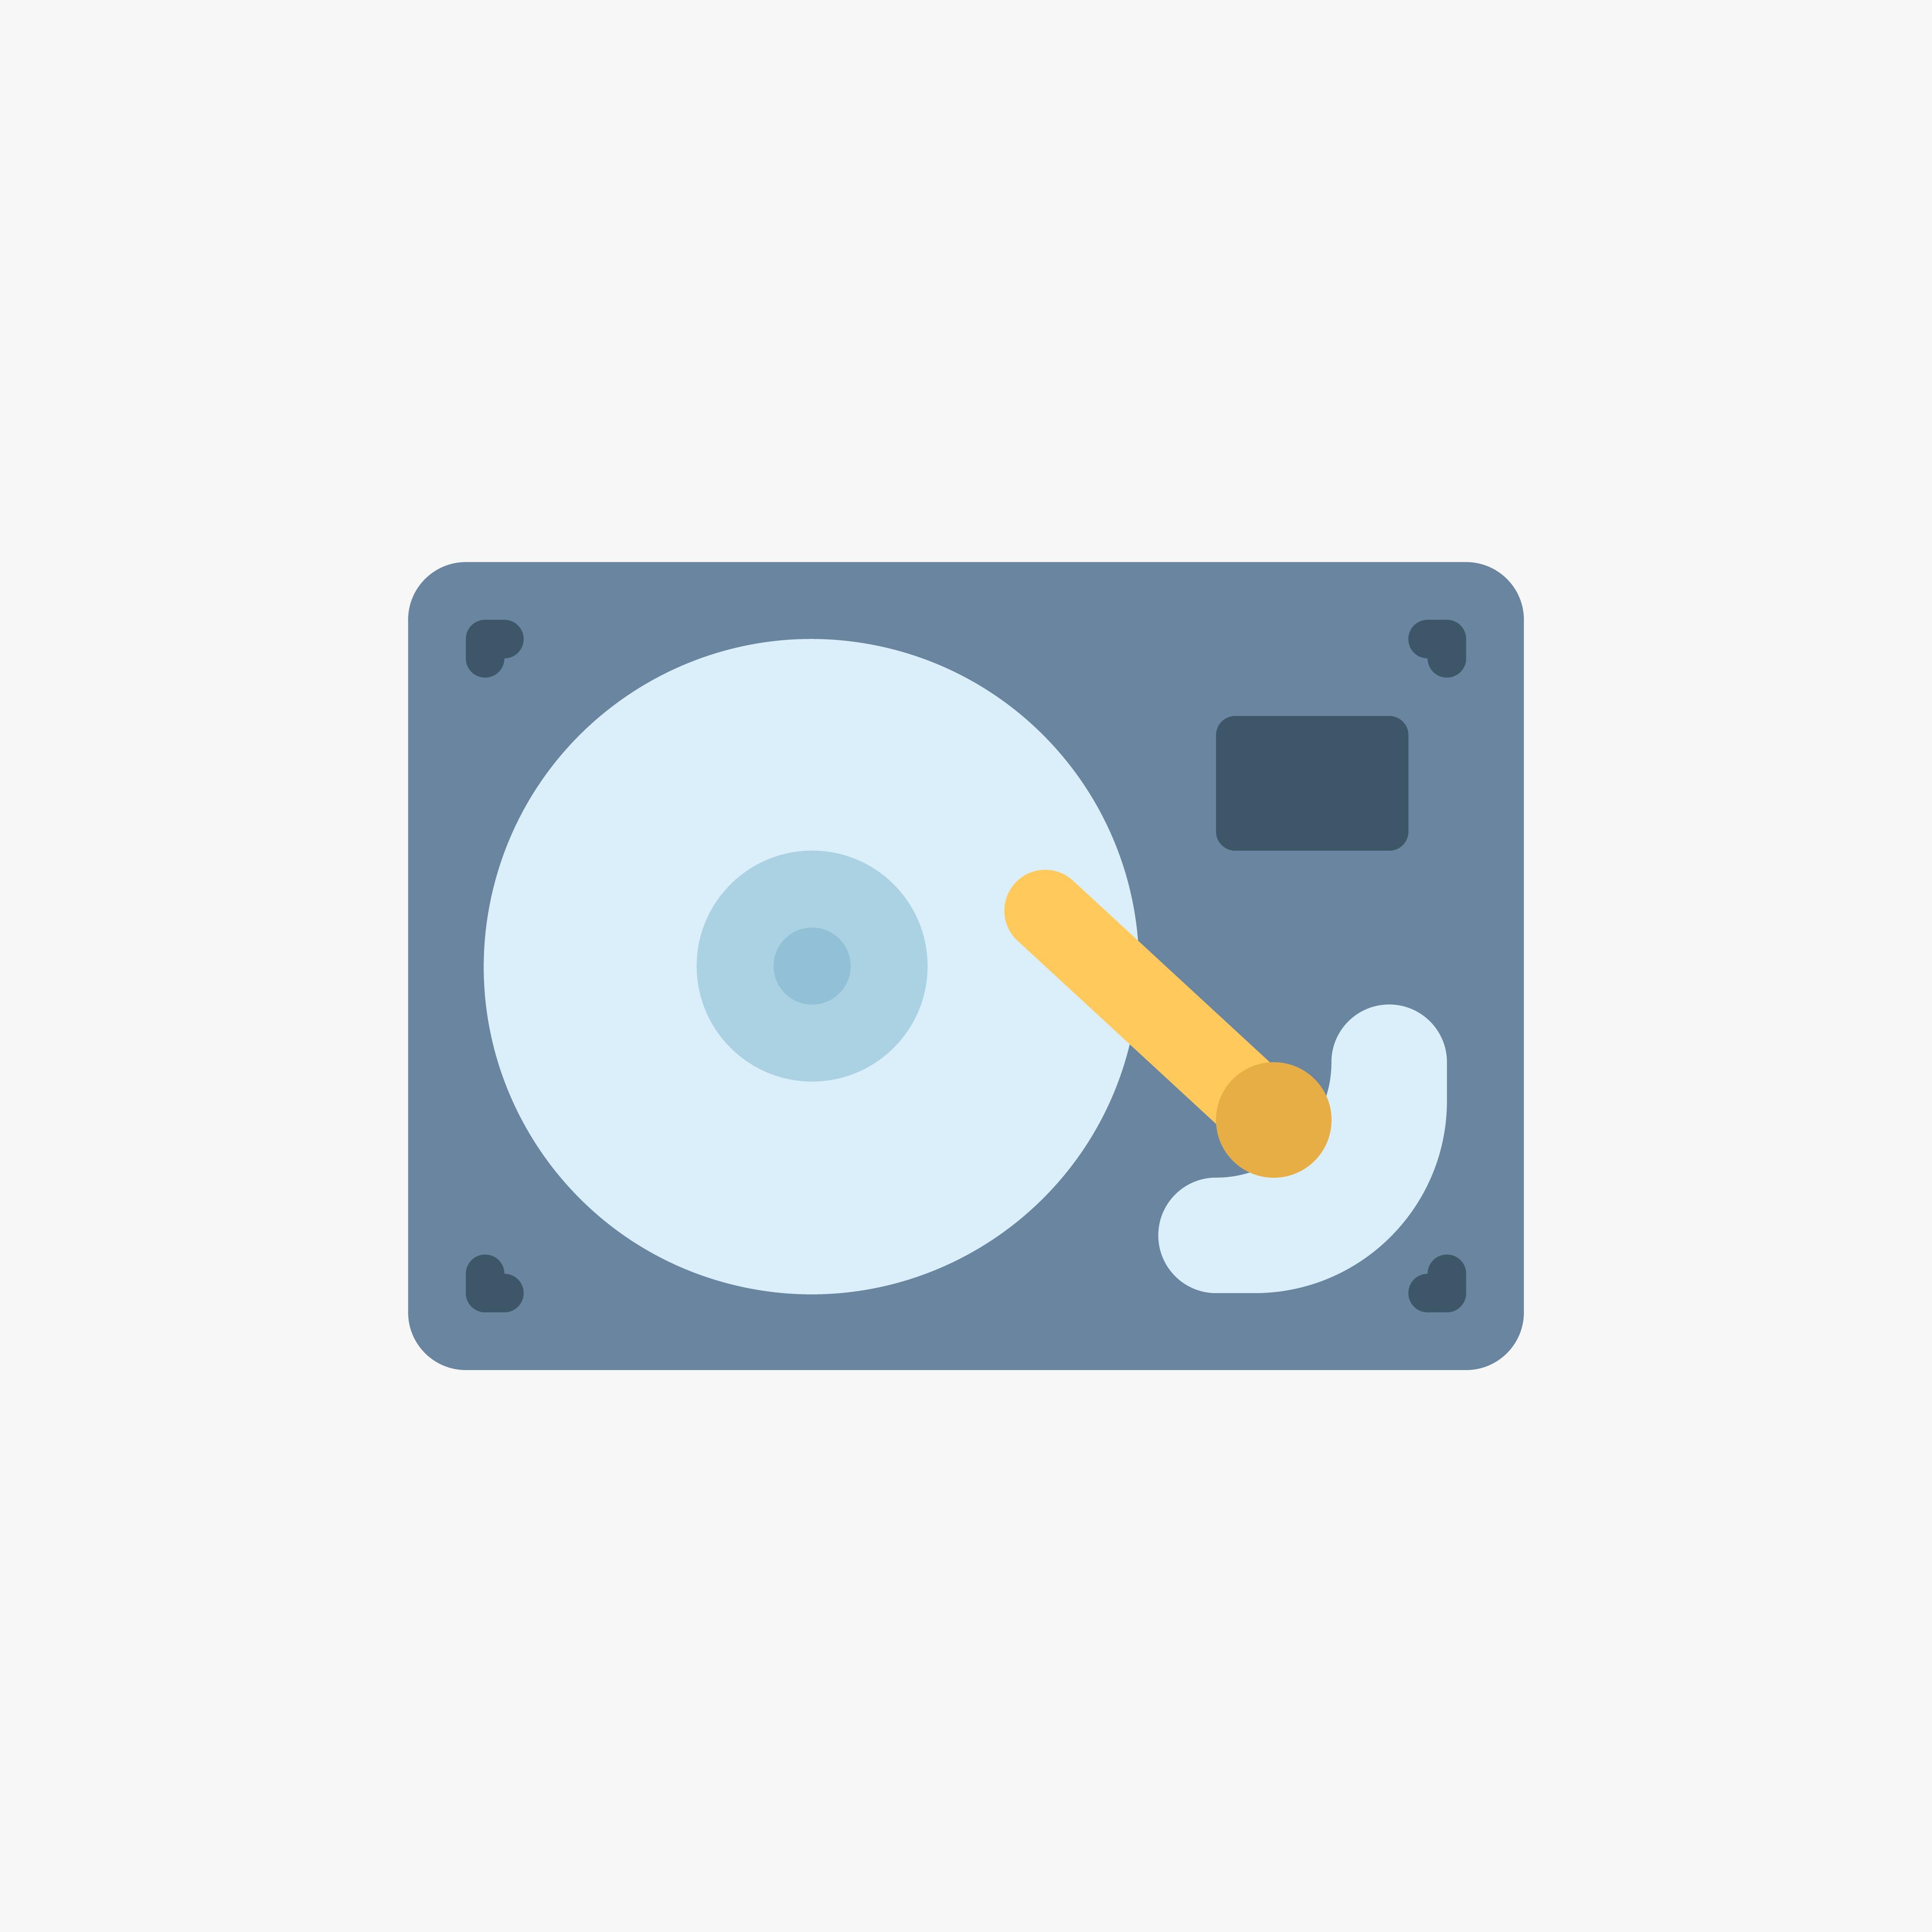 NEXCOM PEAK760VL2, CPU 3GHZ, 21M 2GB DDR2